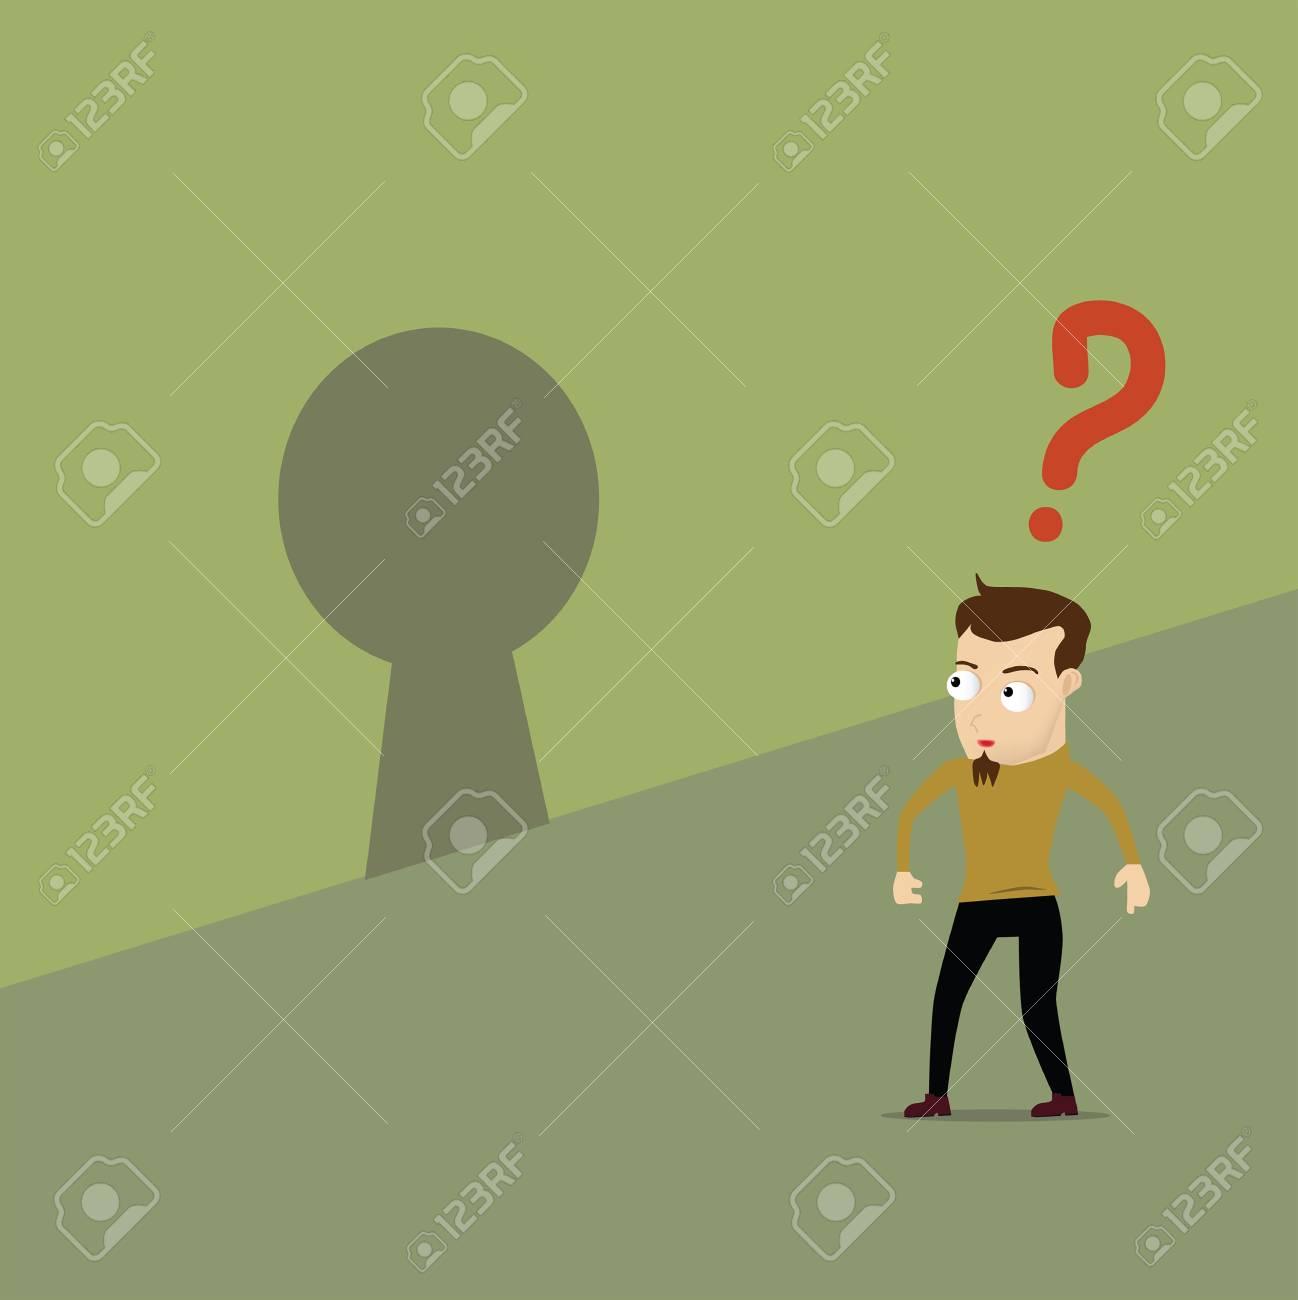 Man question the key hole. Concept idea Stock Vector - 21451942